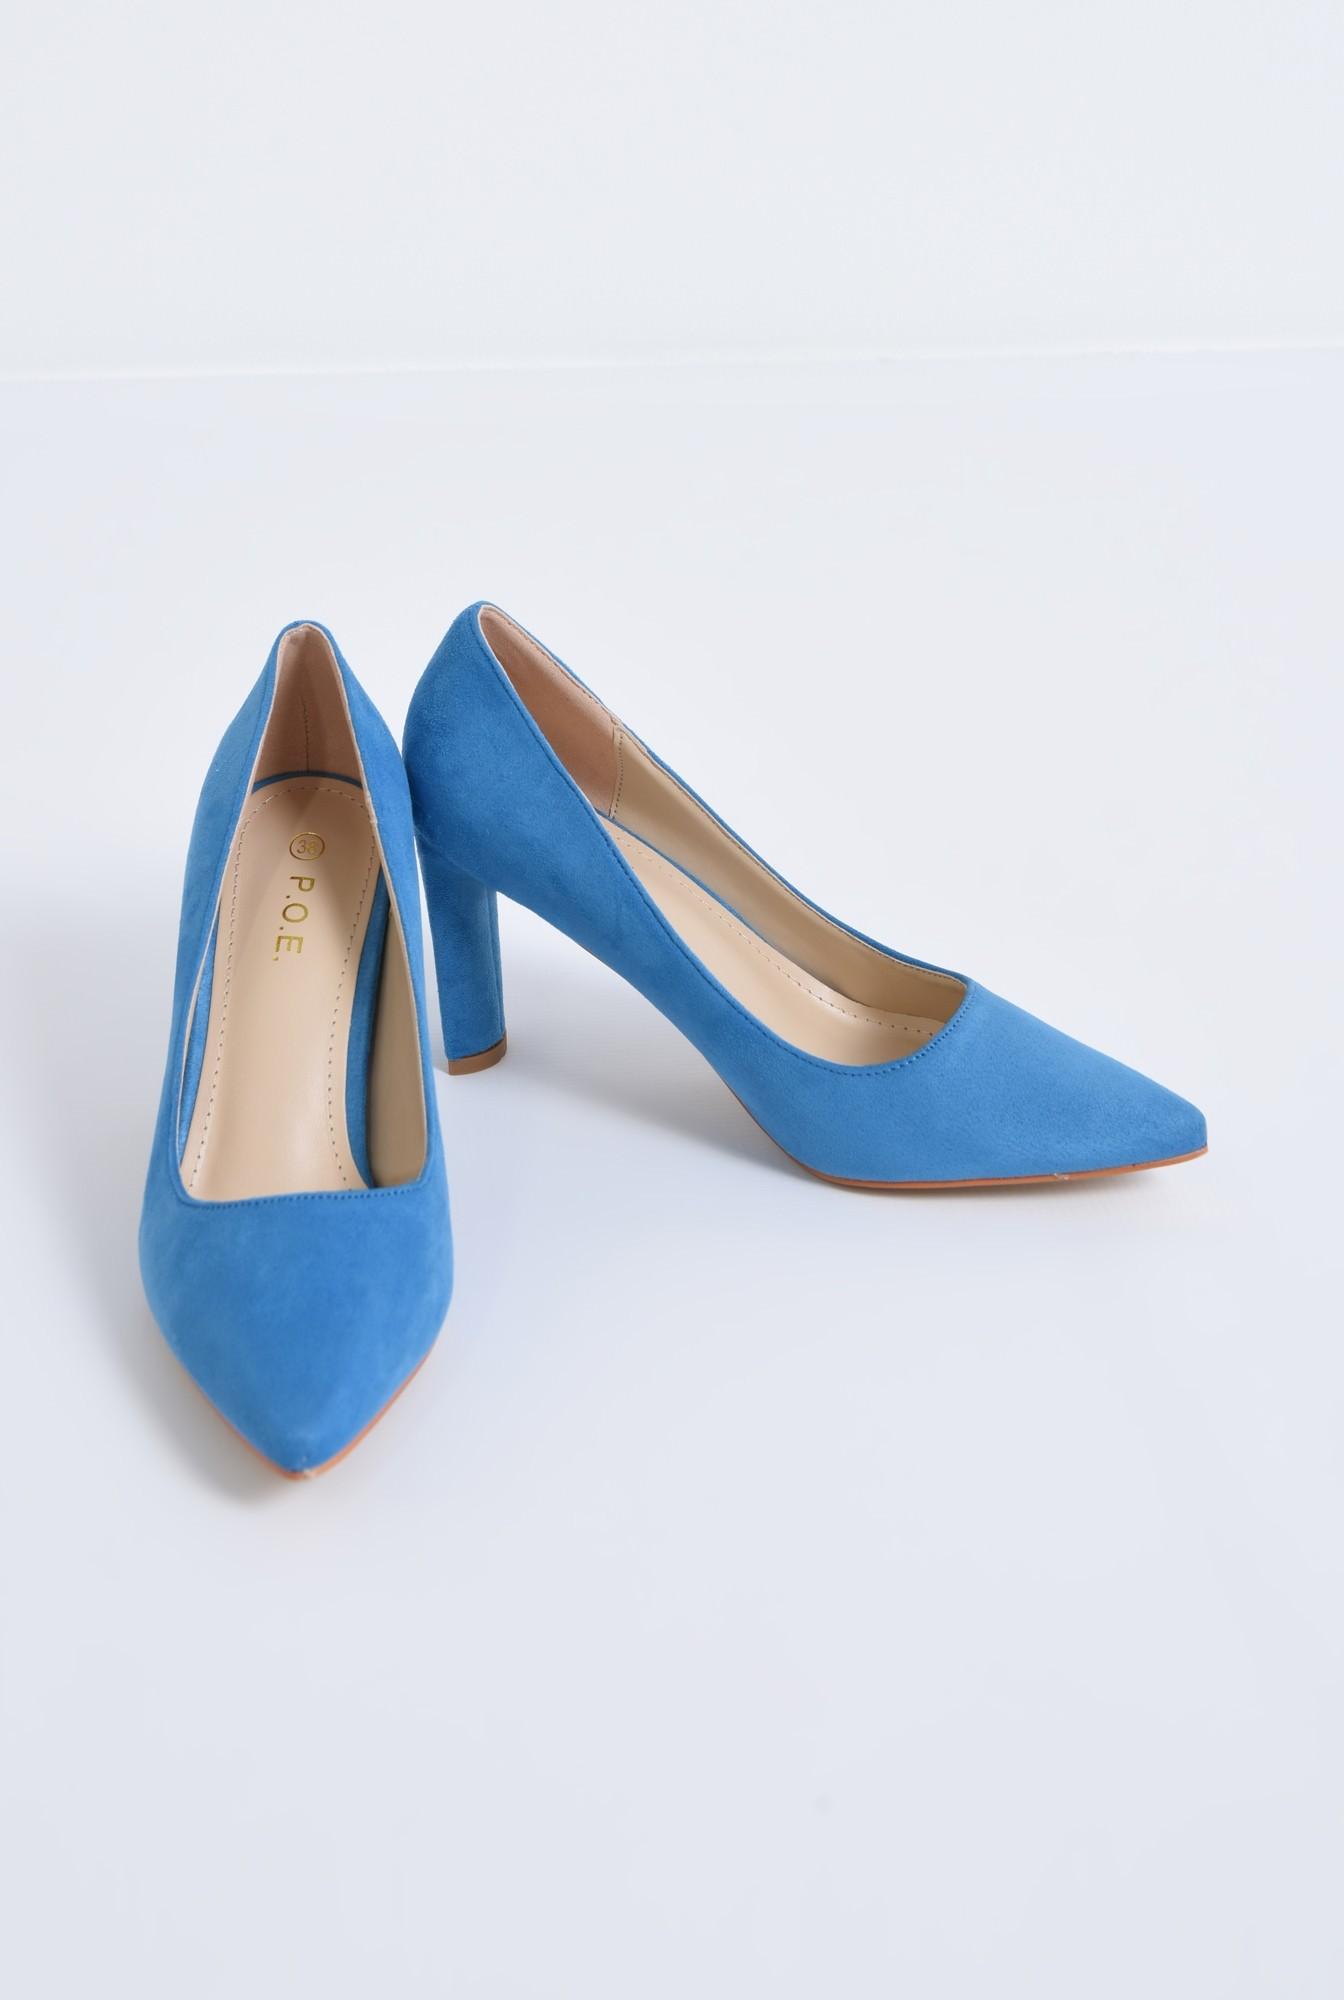 3 - pantofi casual, bleu, toc drept, piele intoarsa